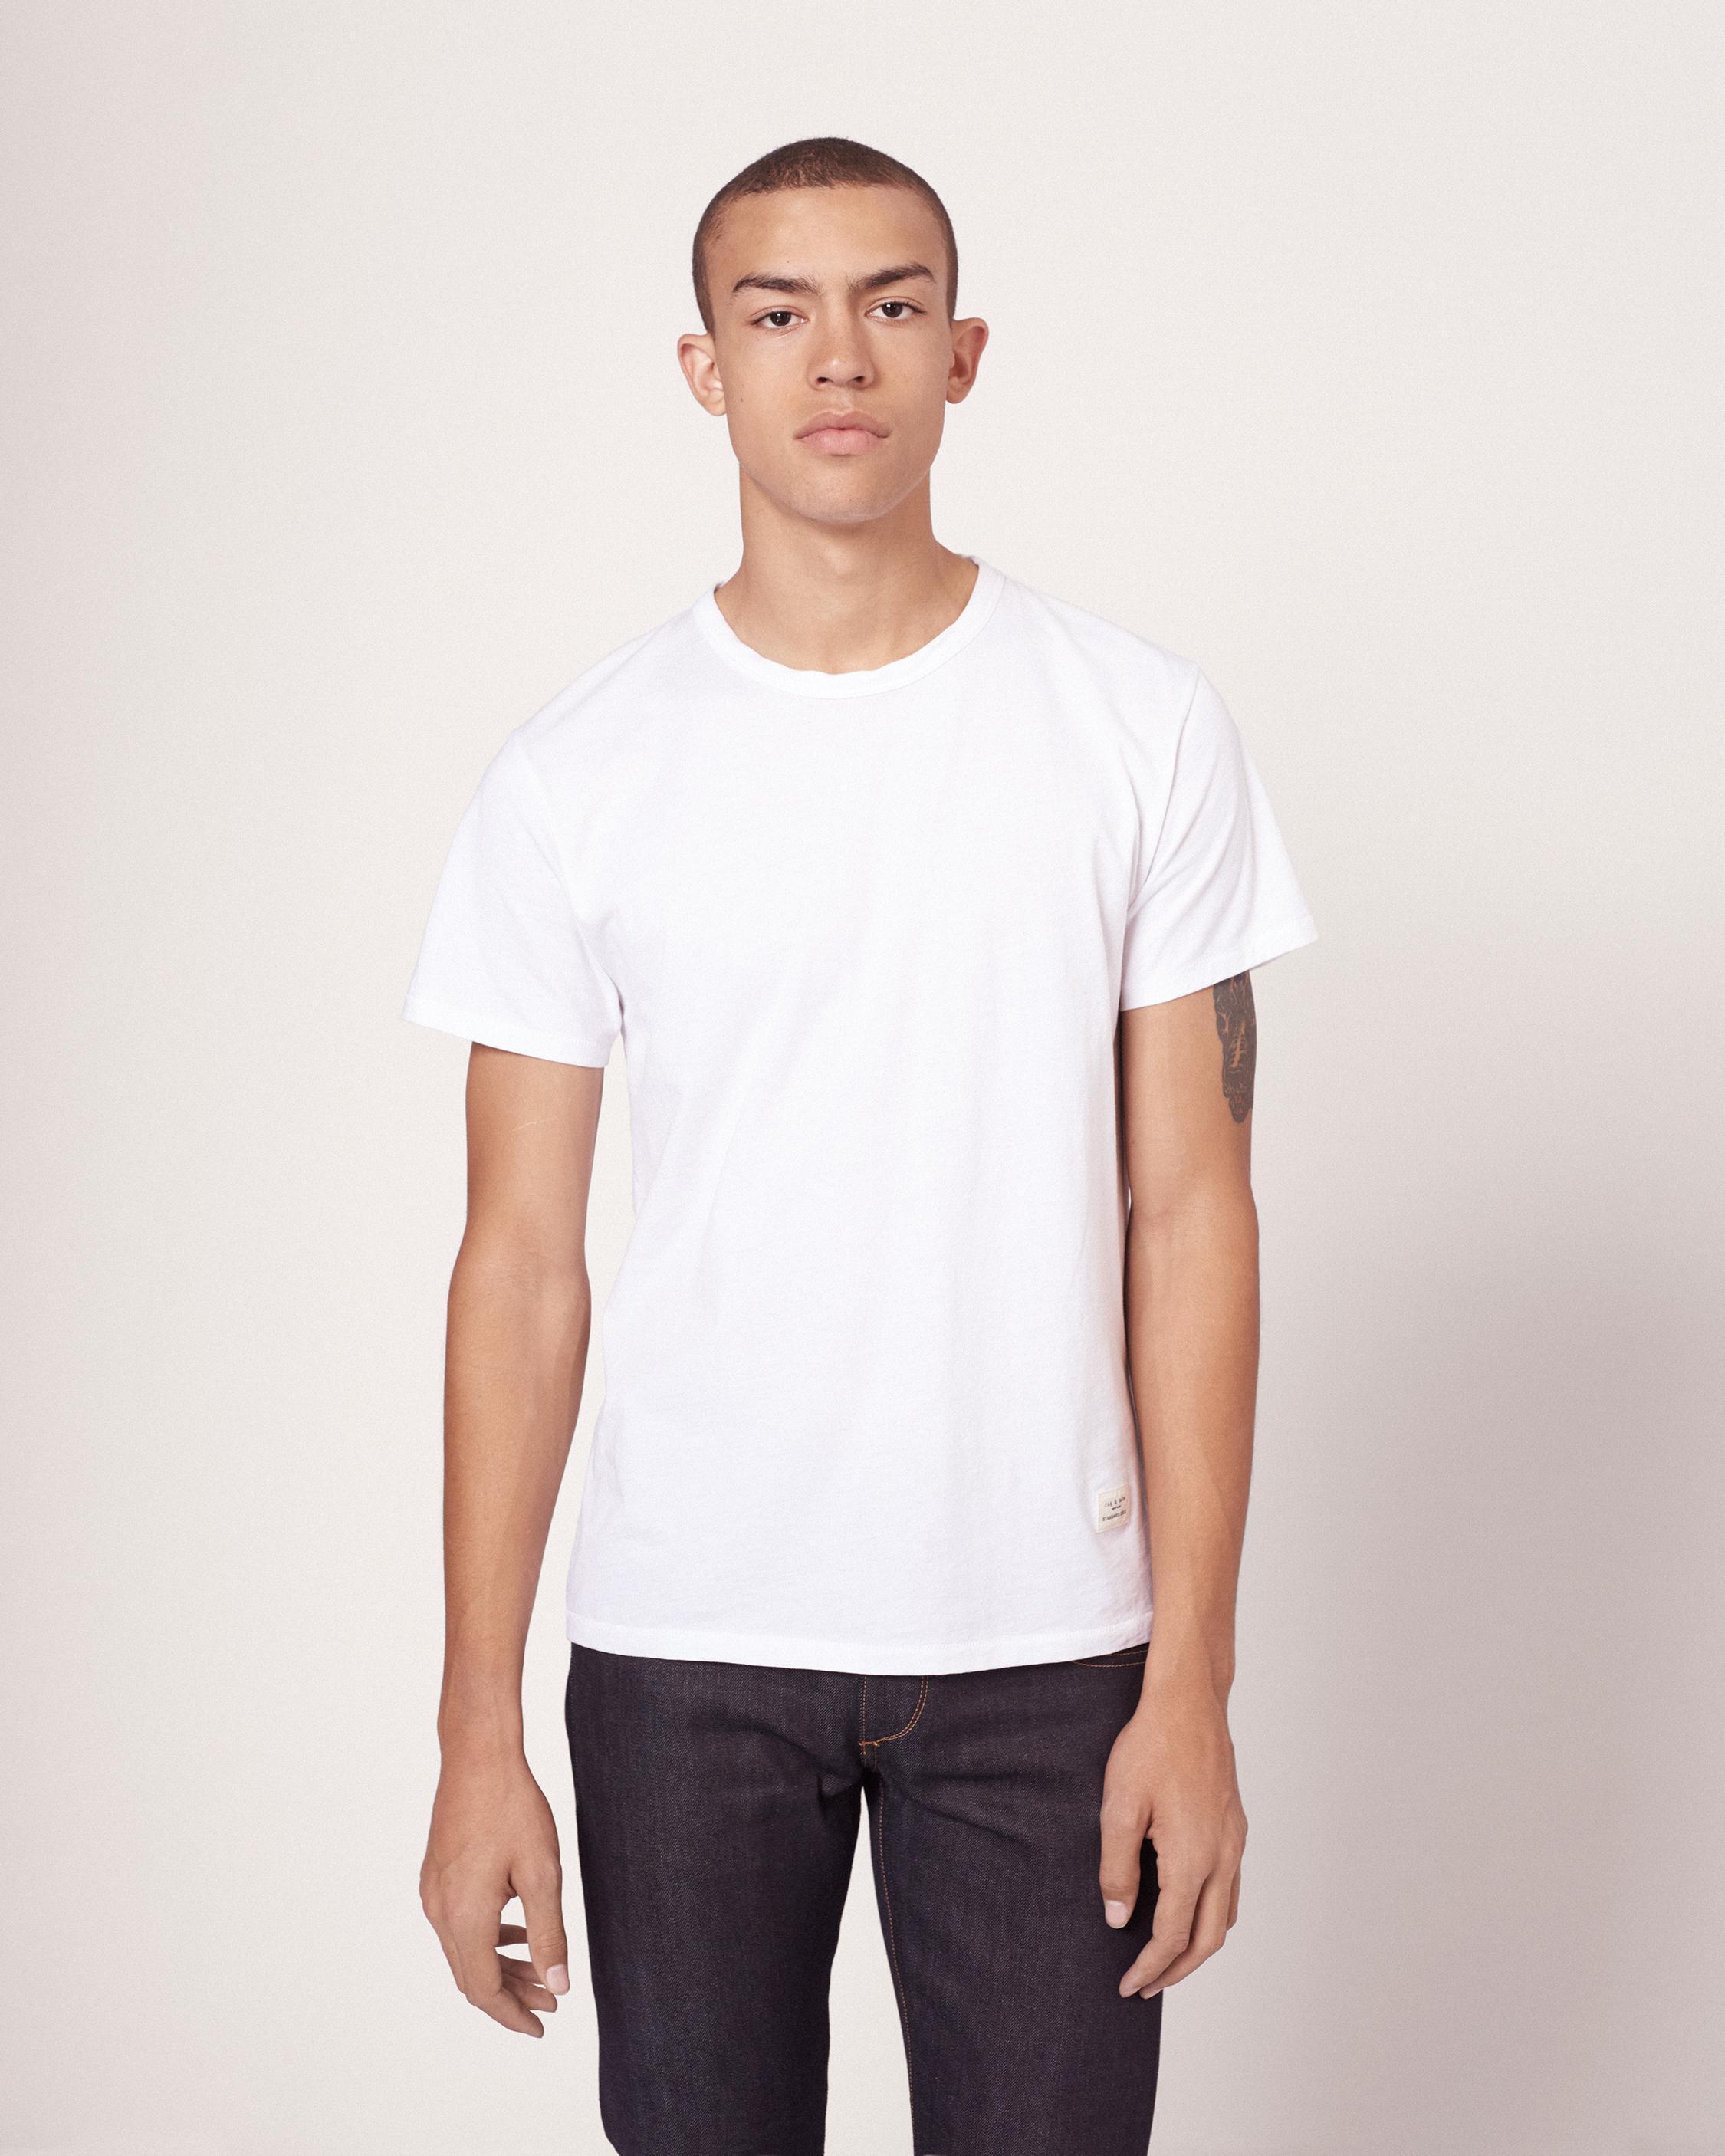 Clearance 2018 Cheap Footlocker Rag & Bone classic T-shirt Cheap Sale Purchase Discount Low Shipping Cheap Reliable A3xvzY